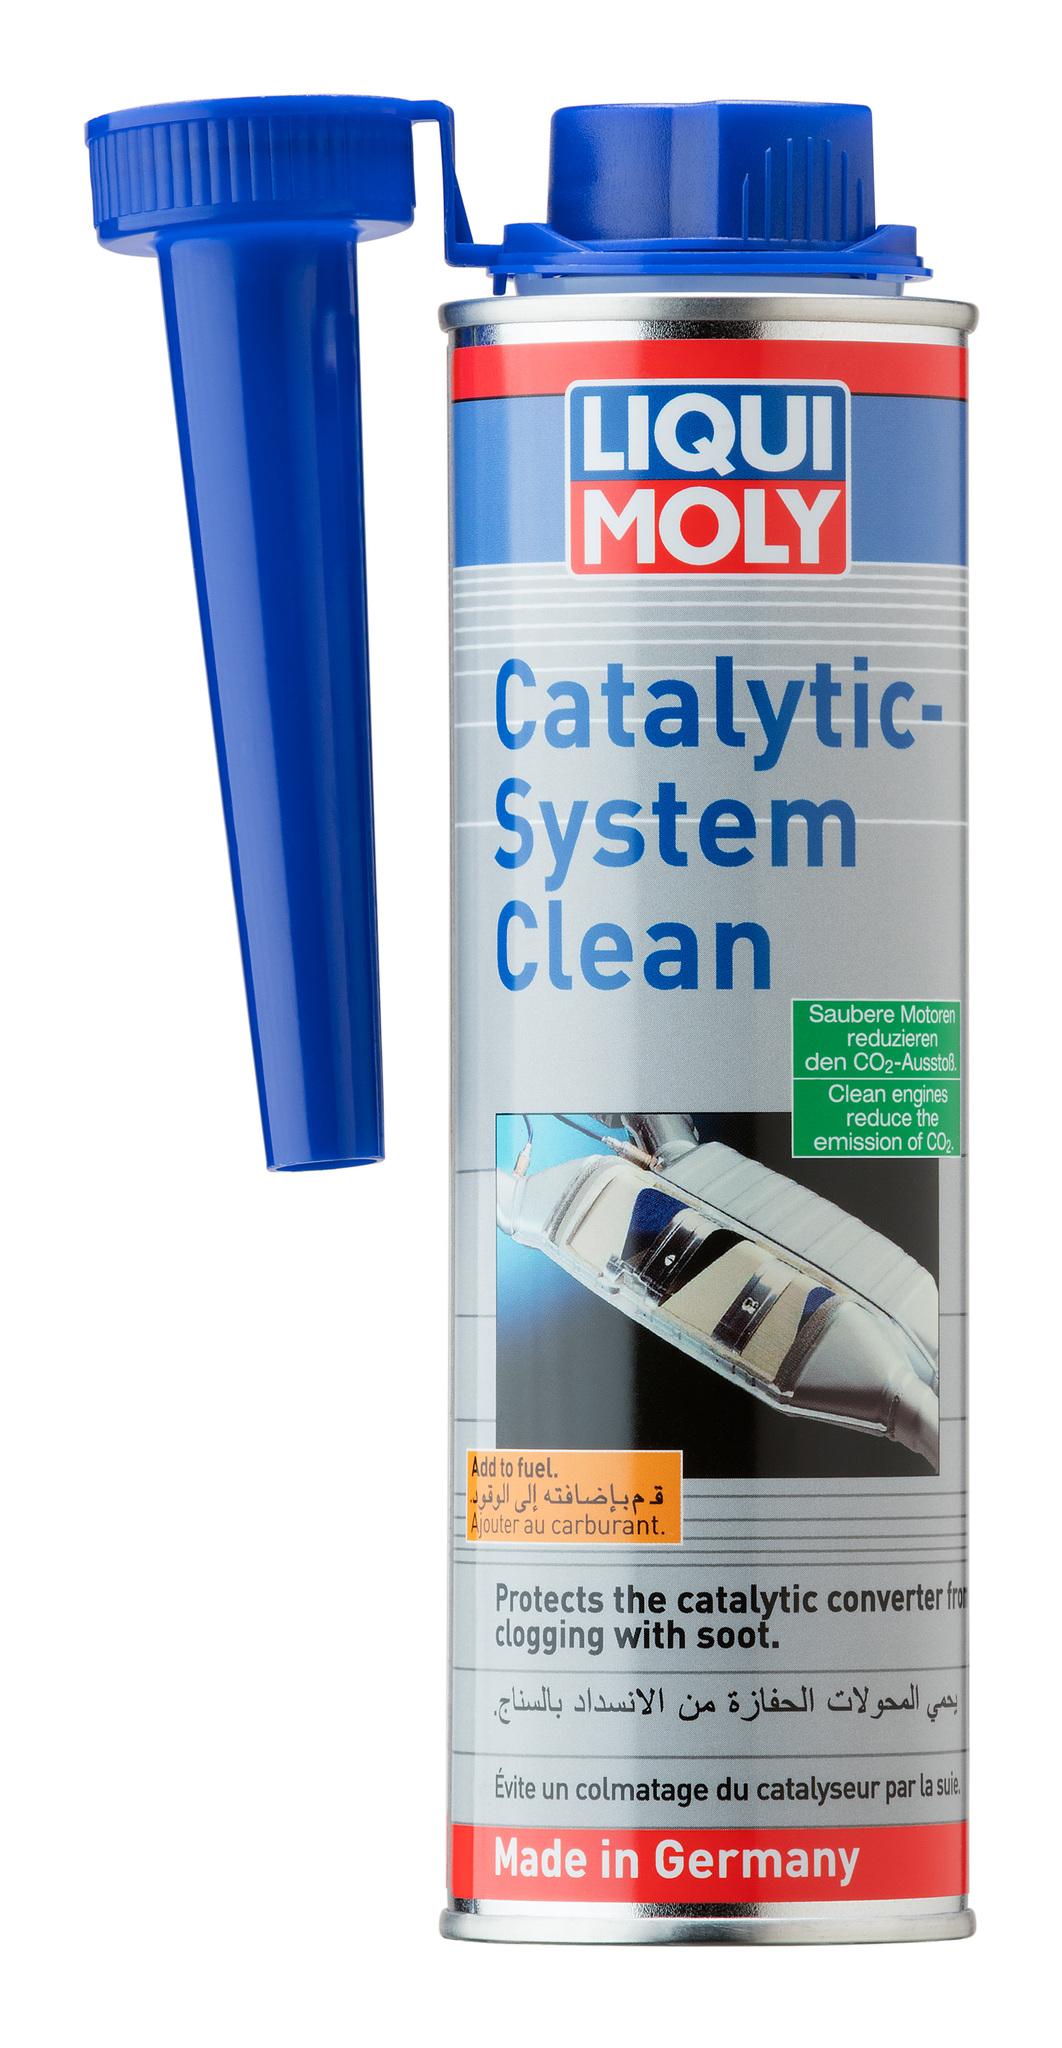 Liqui Moly Catalytic System Clean Очиститель катализатора